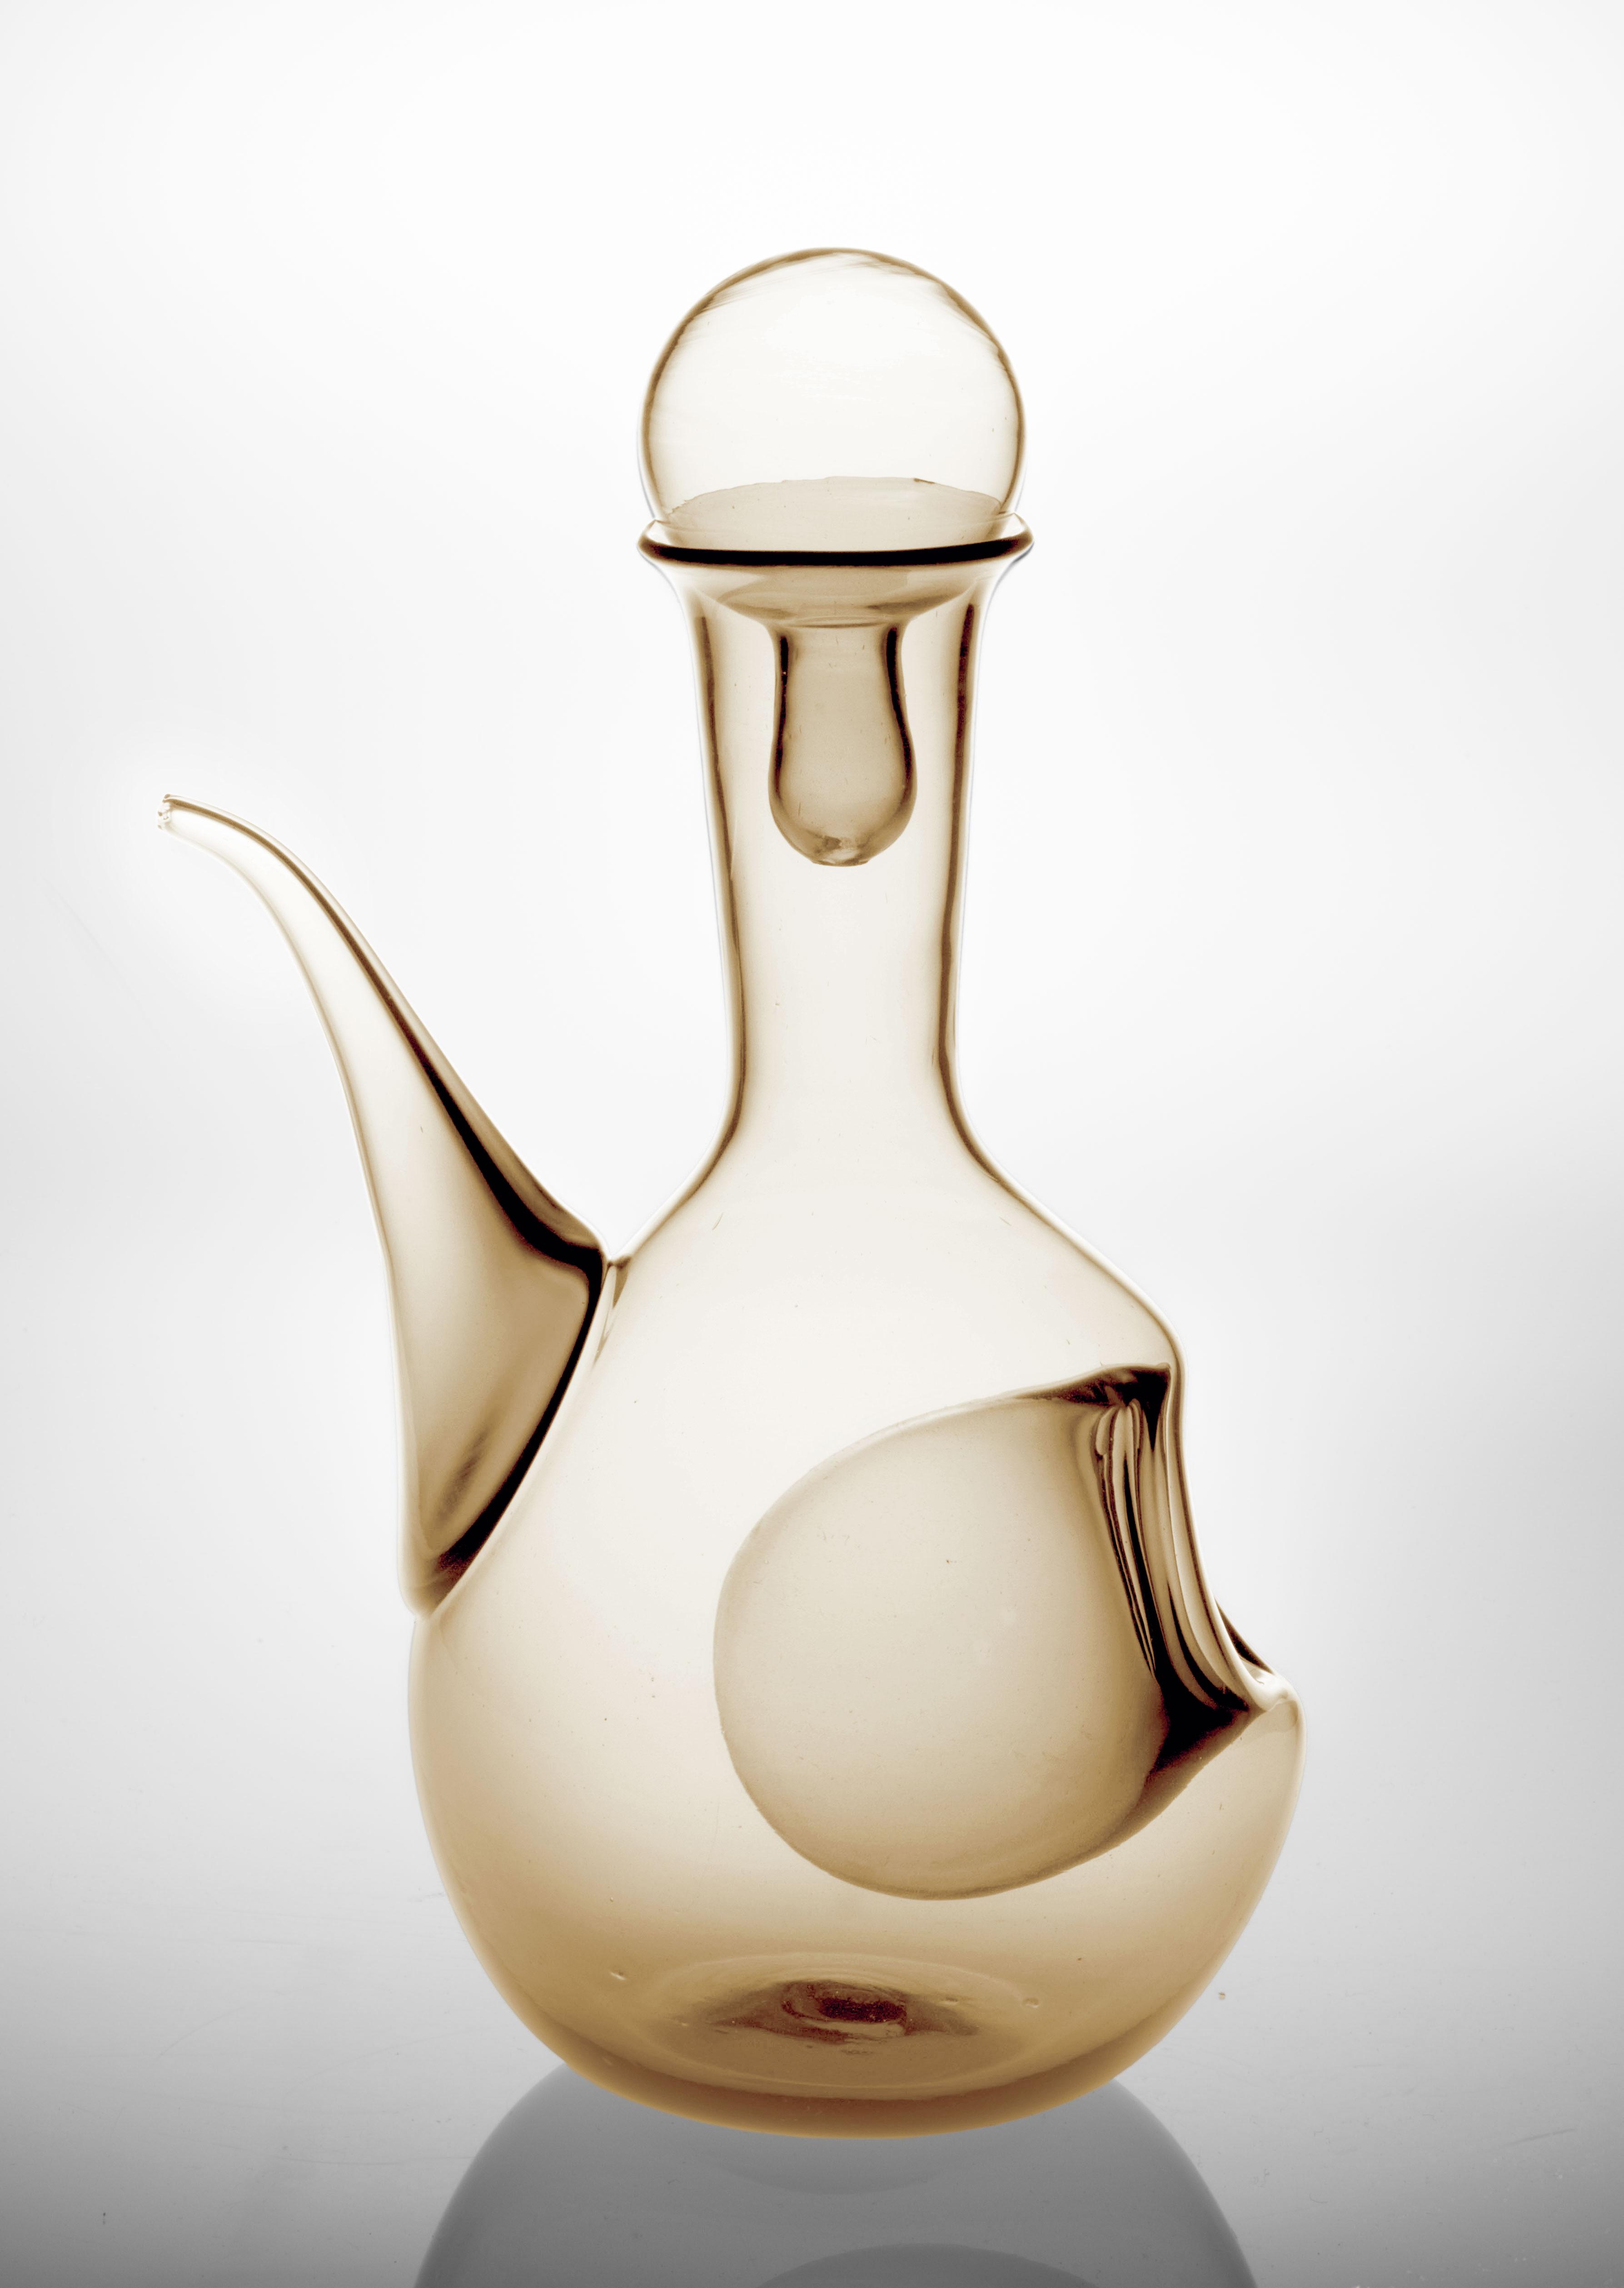 Ice Cruet oil jar by Segno Italiano | Flodeau.com